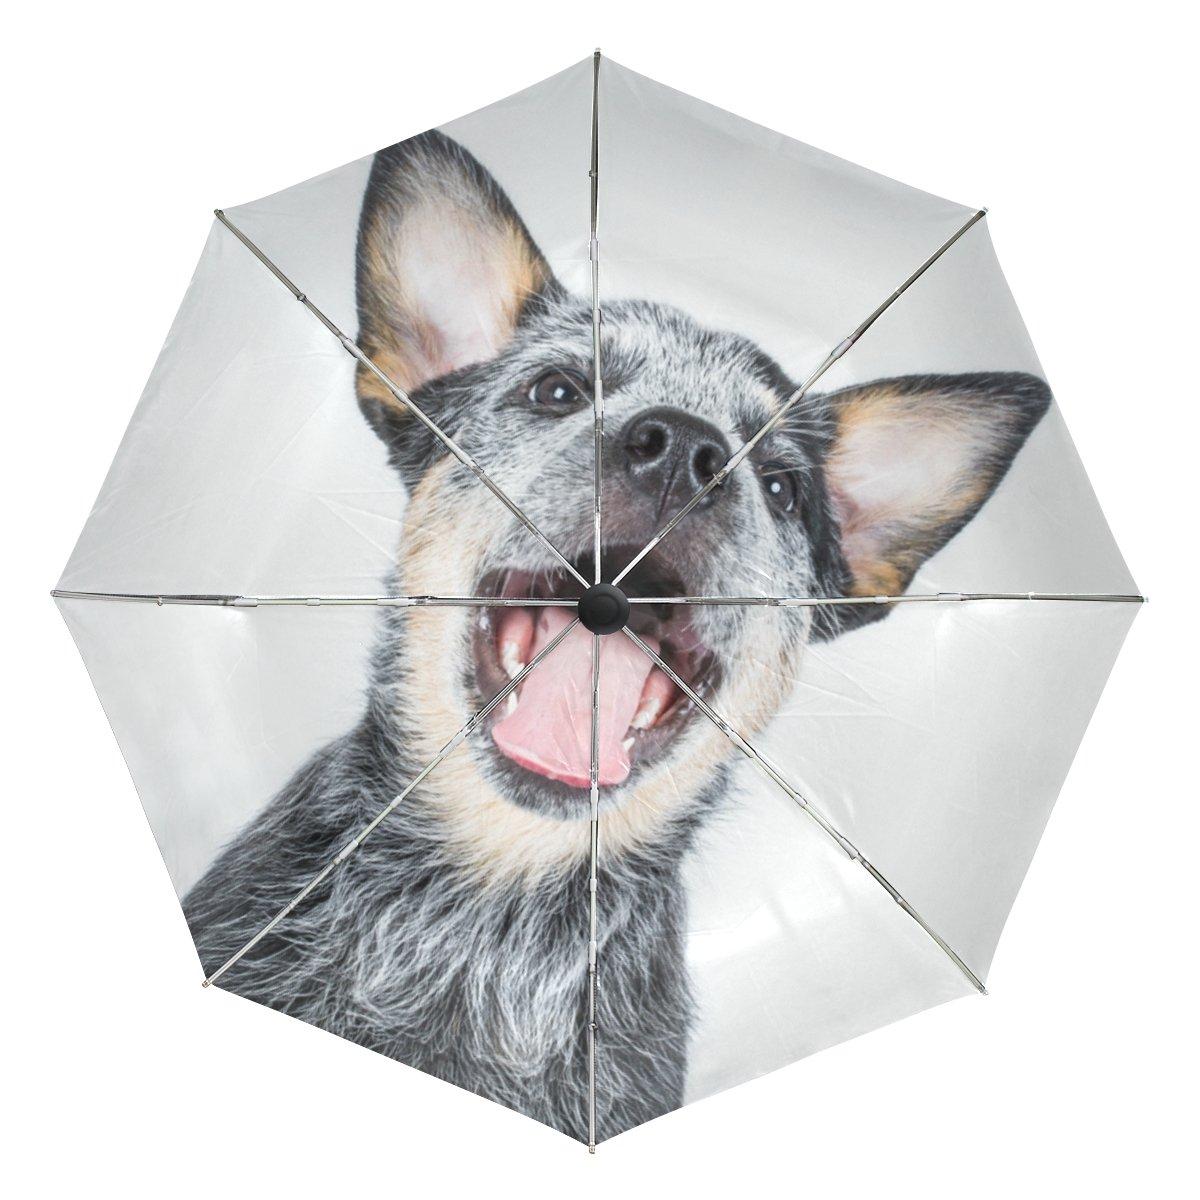 La Random Australian Cattle Dog Custom Windproof UV Proof Automatic Umbrella Foldable Compact Travel Umbrella chic